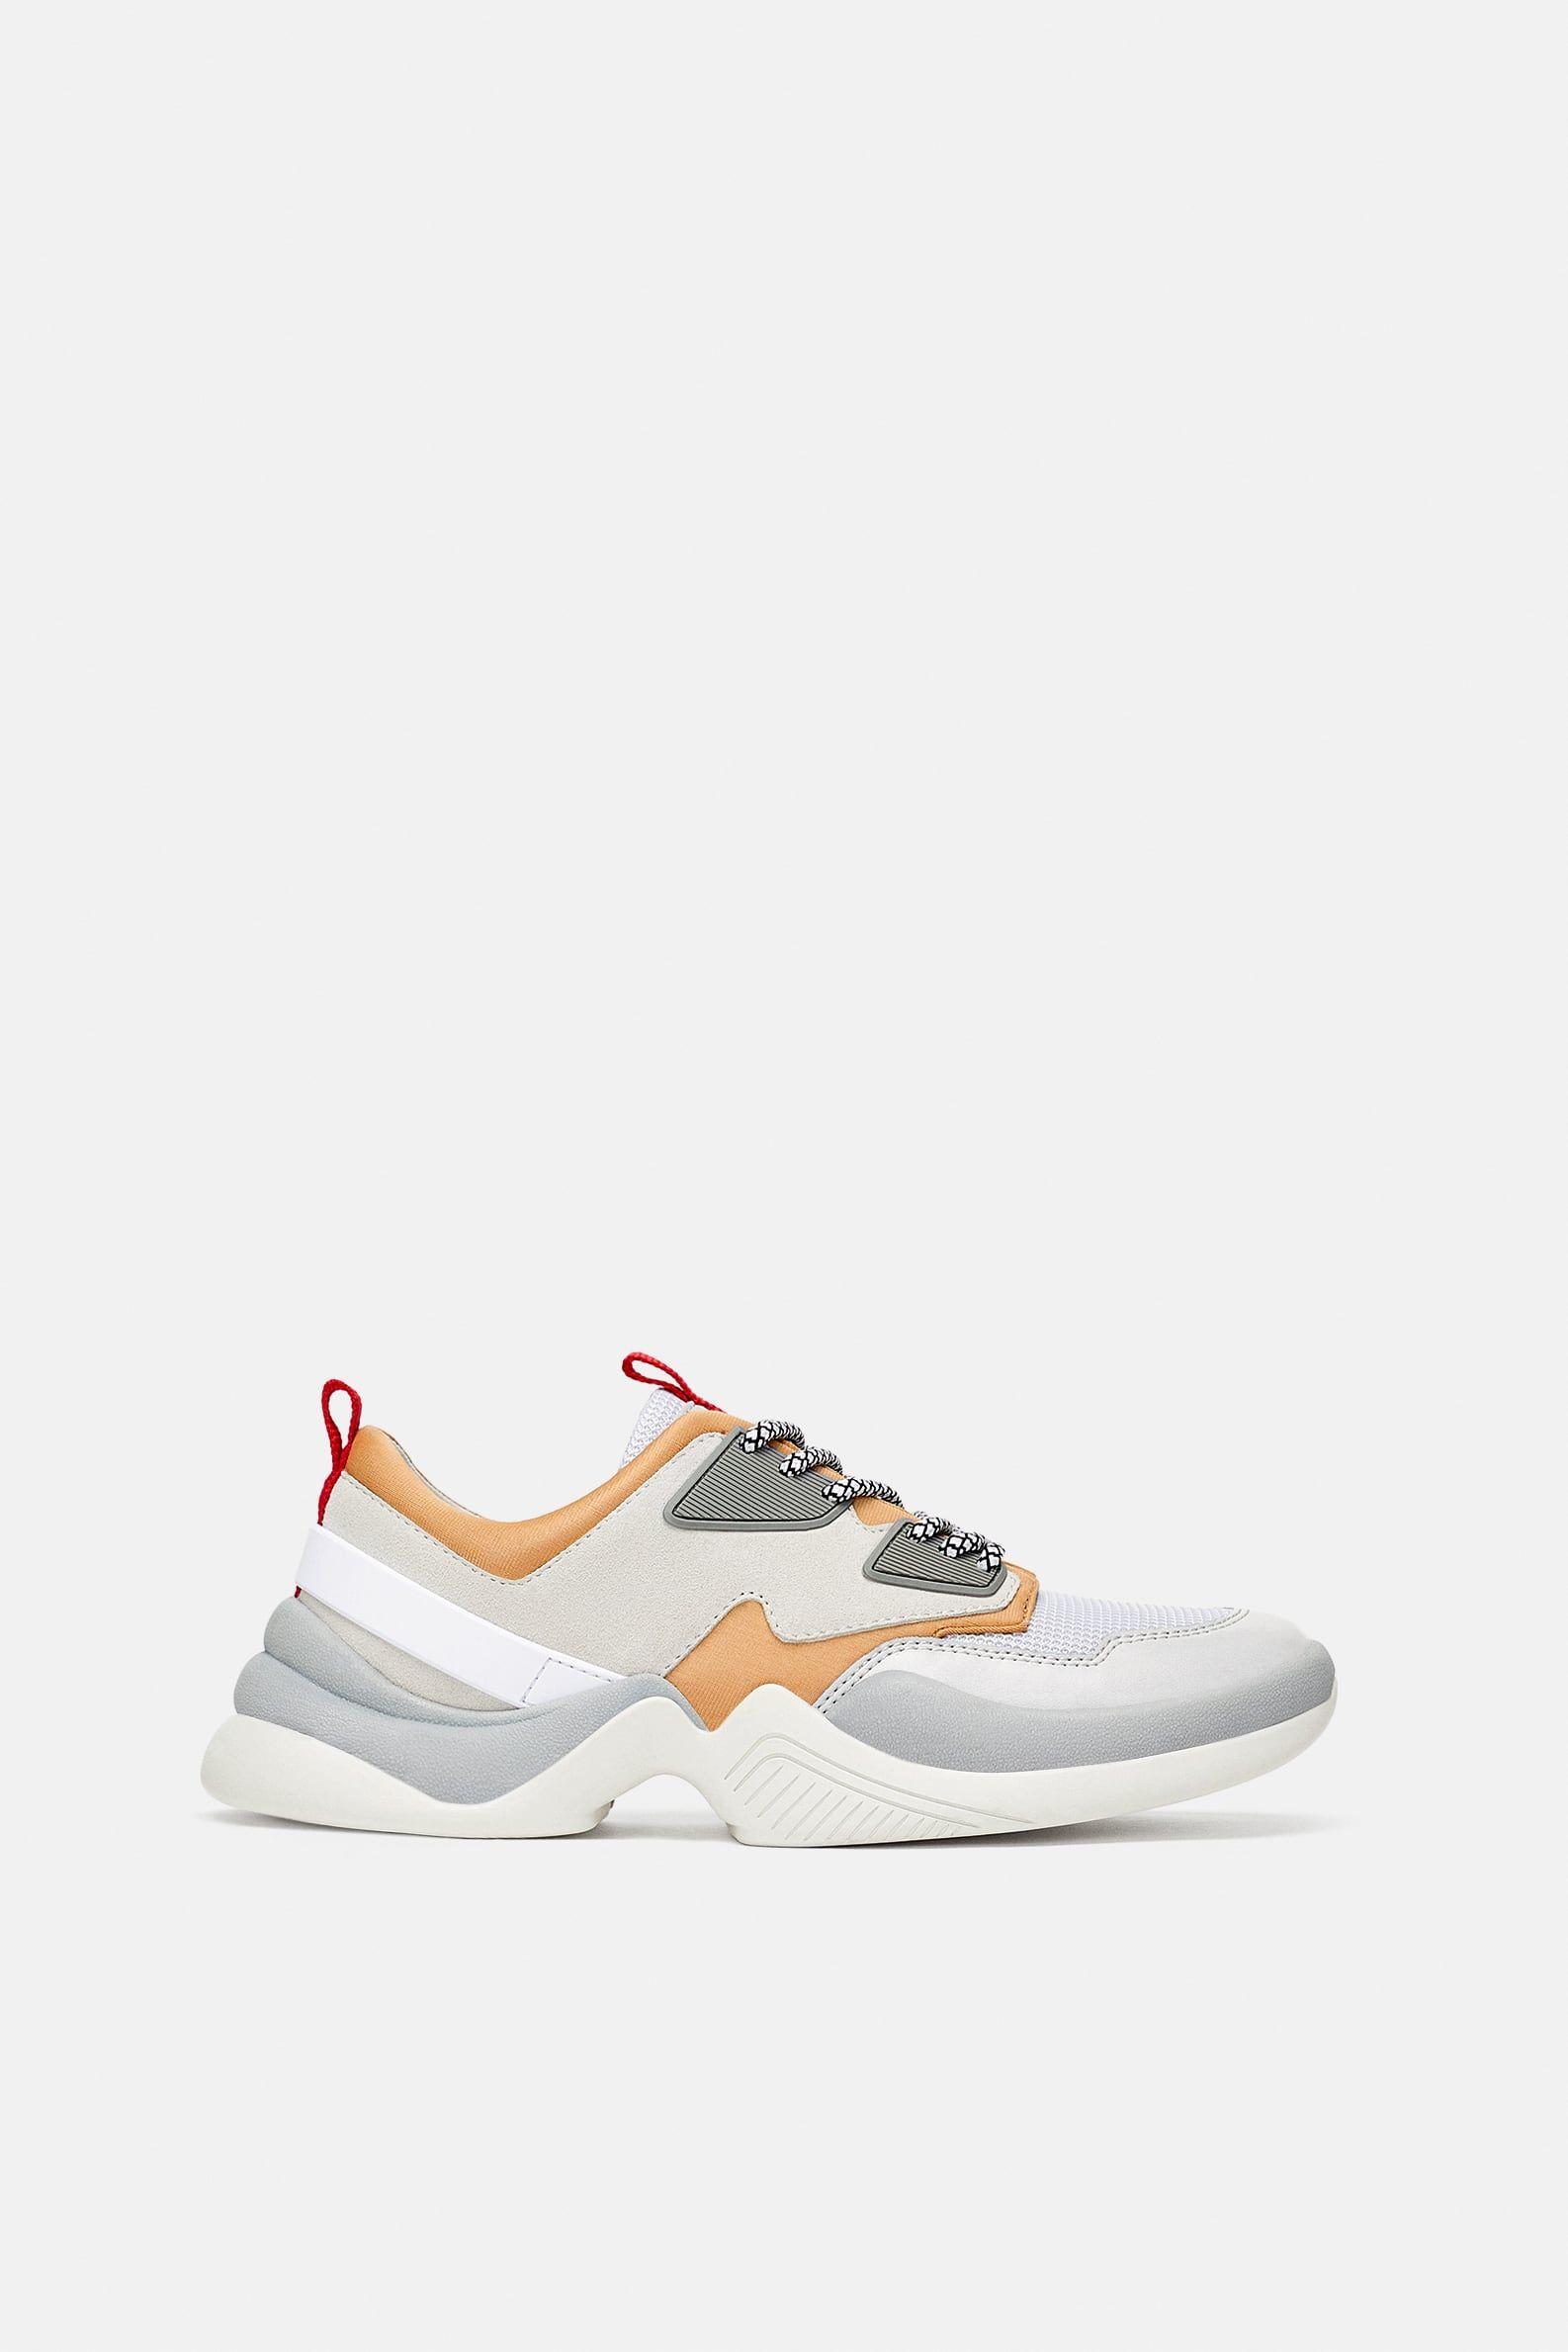 Sneakers mode, Adidas schuhe